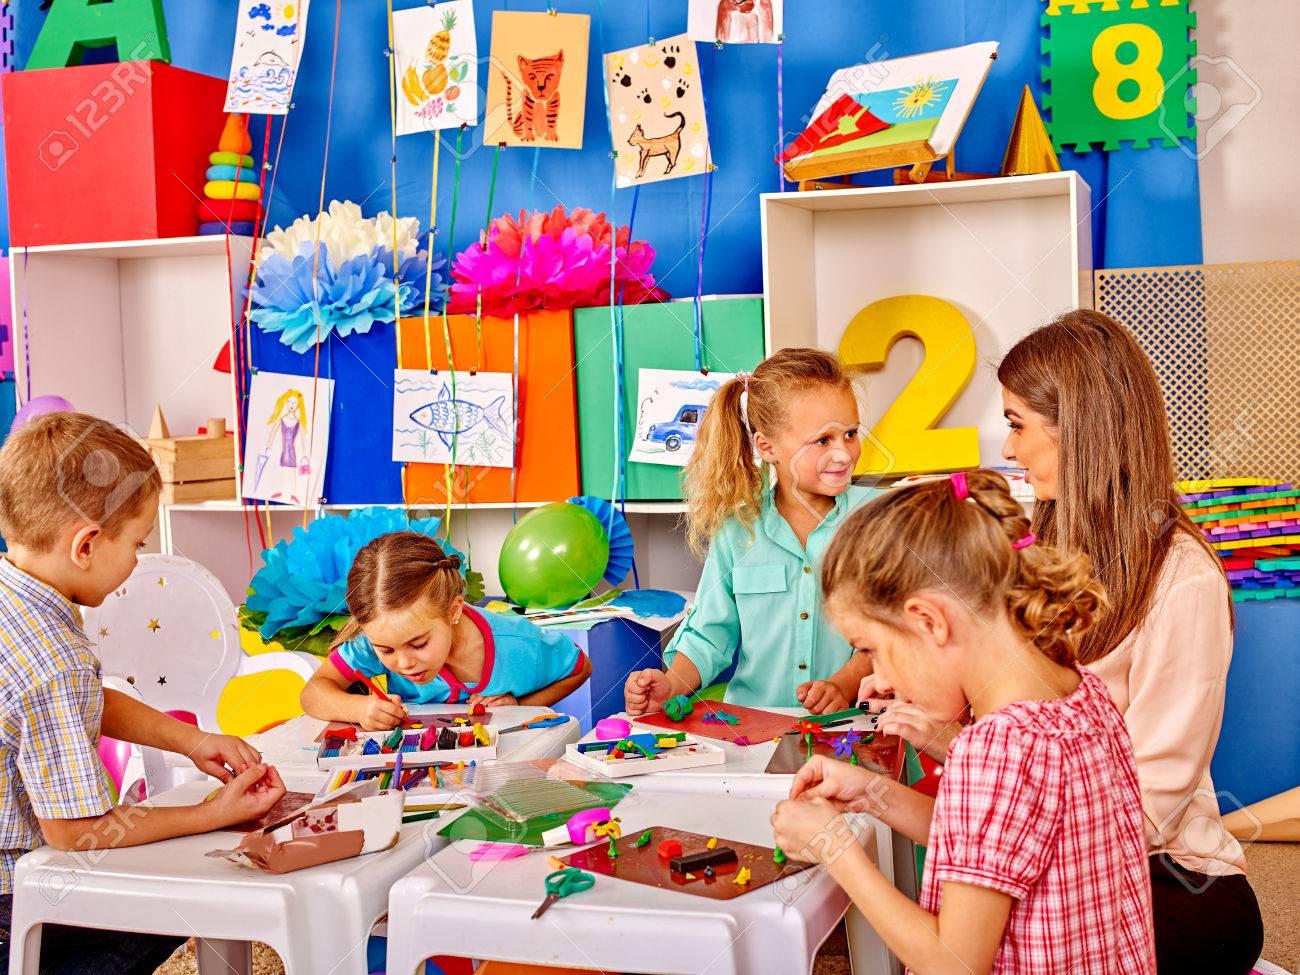 Lasrge Group beauty kids sculpt by plasticine on table in kindergarten . - 48495029